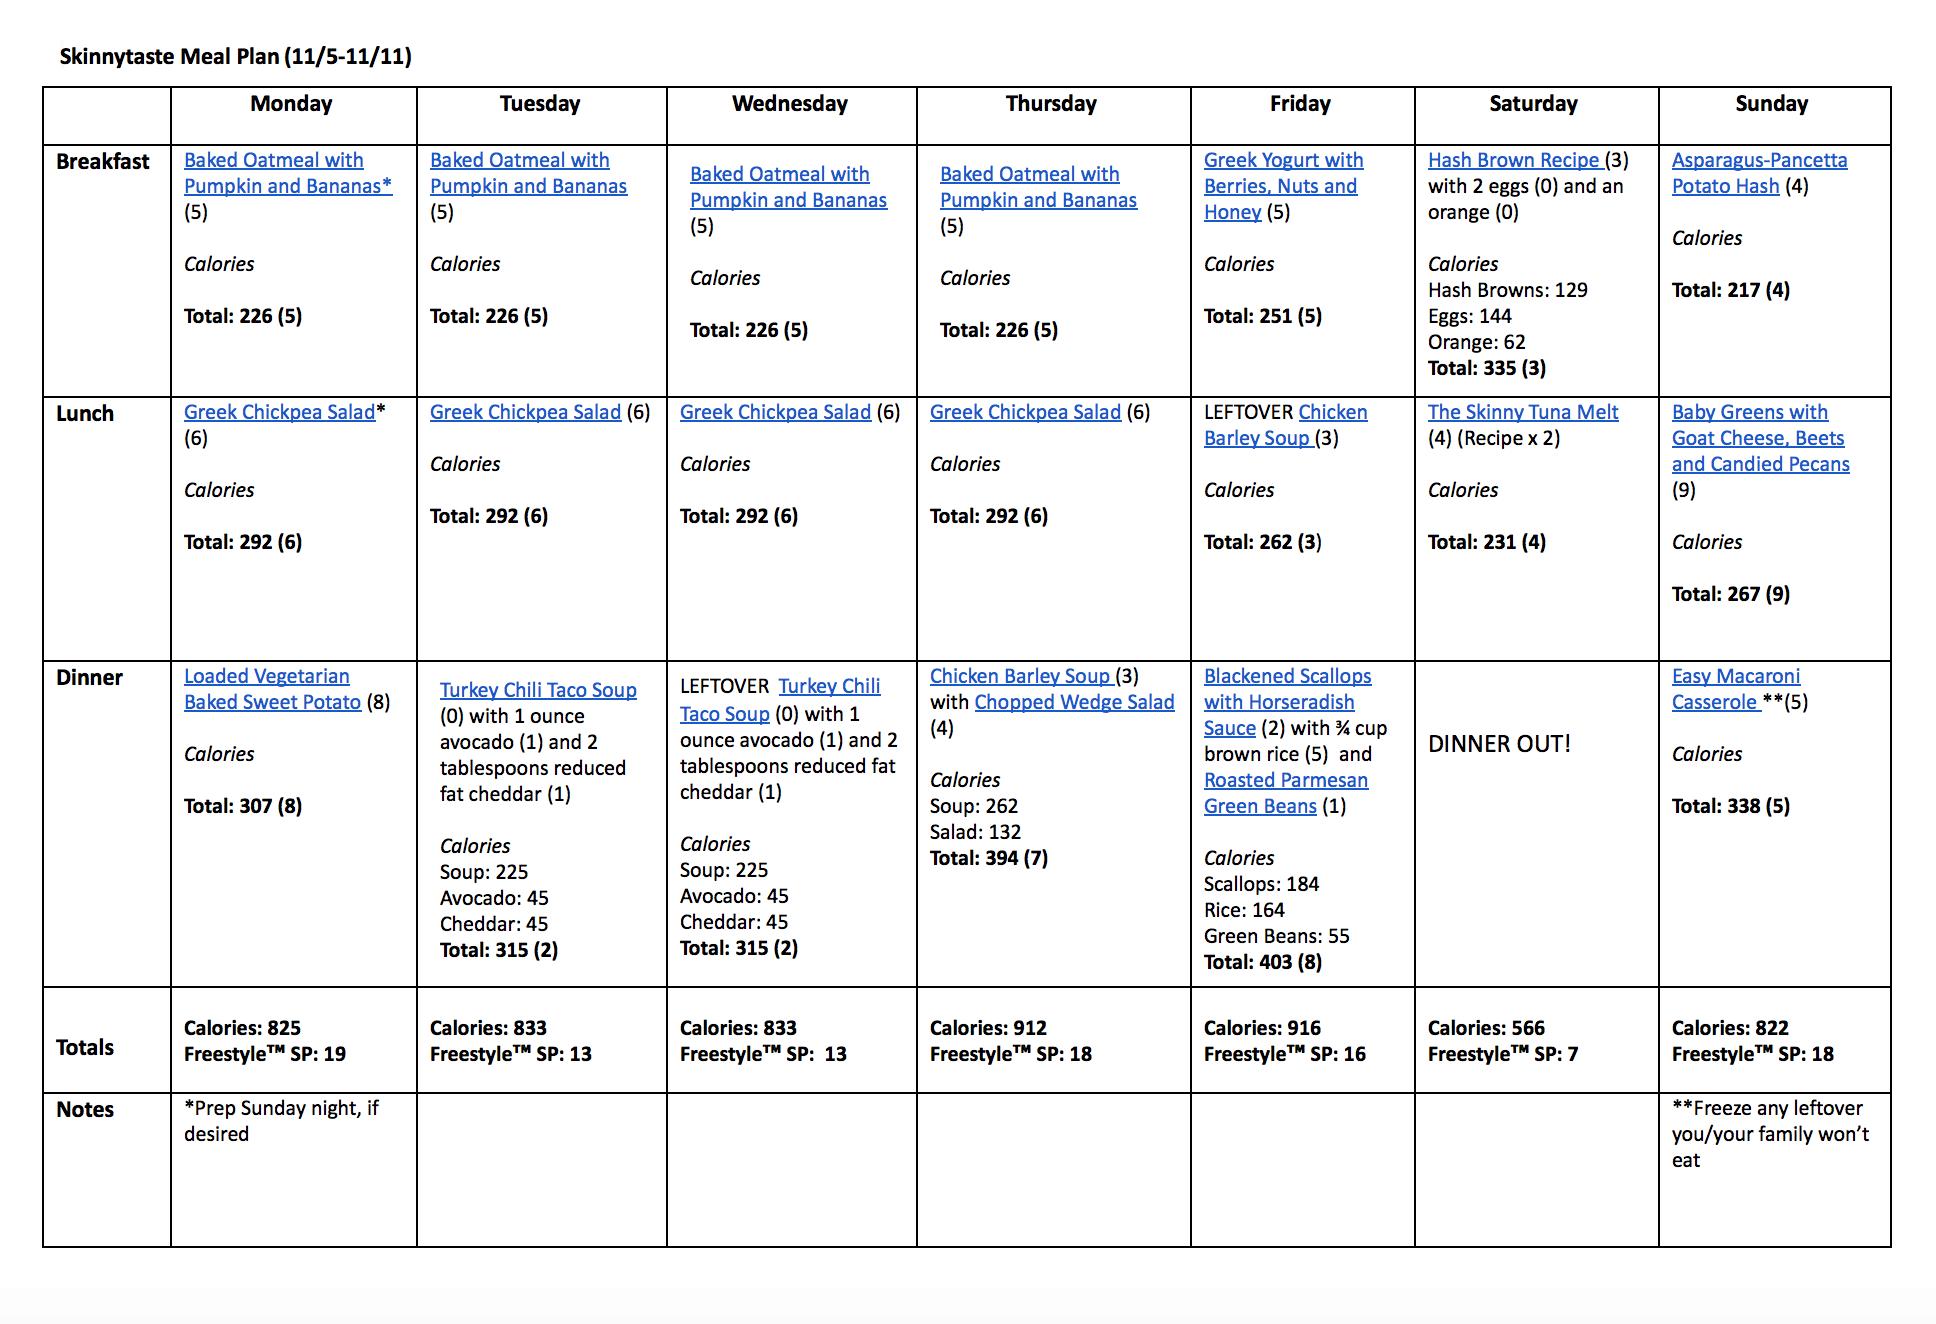 Skinnytaste Meal Plan (November 5-November 11)